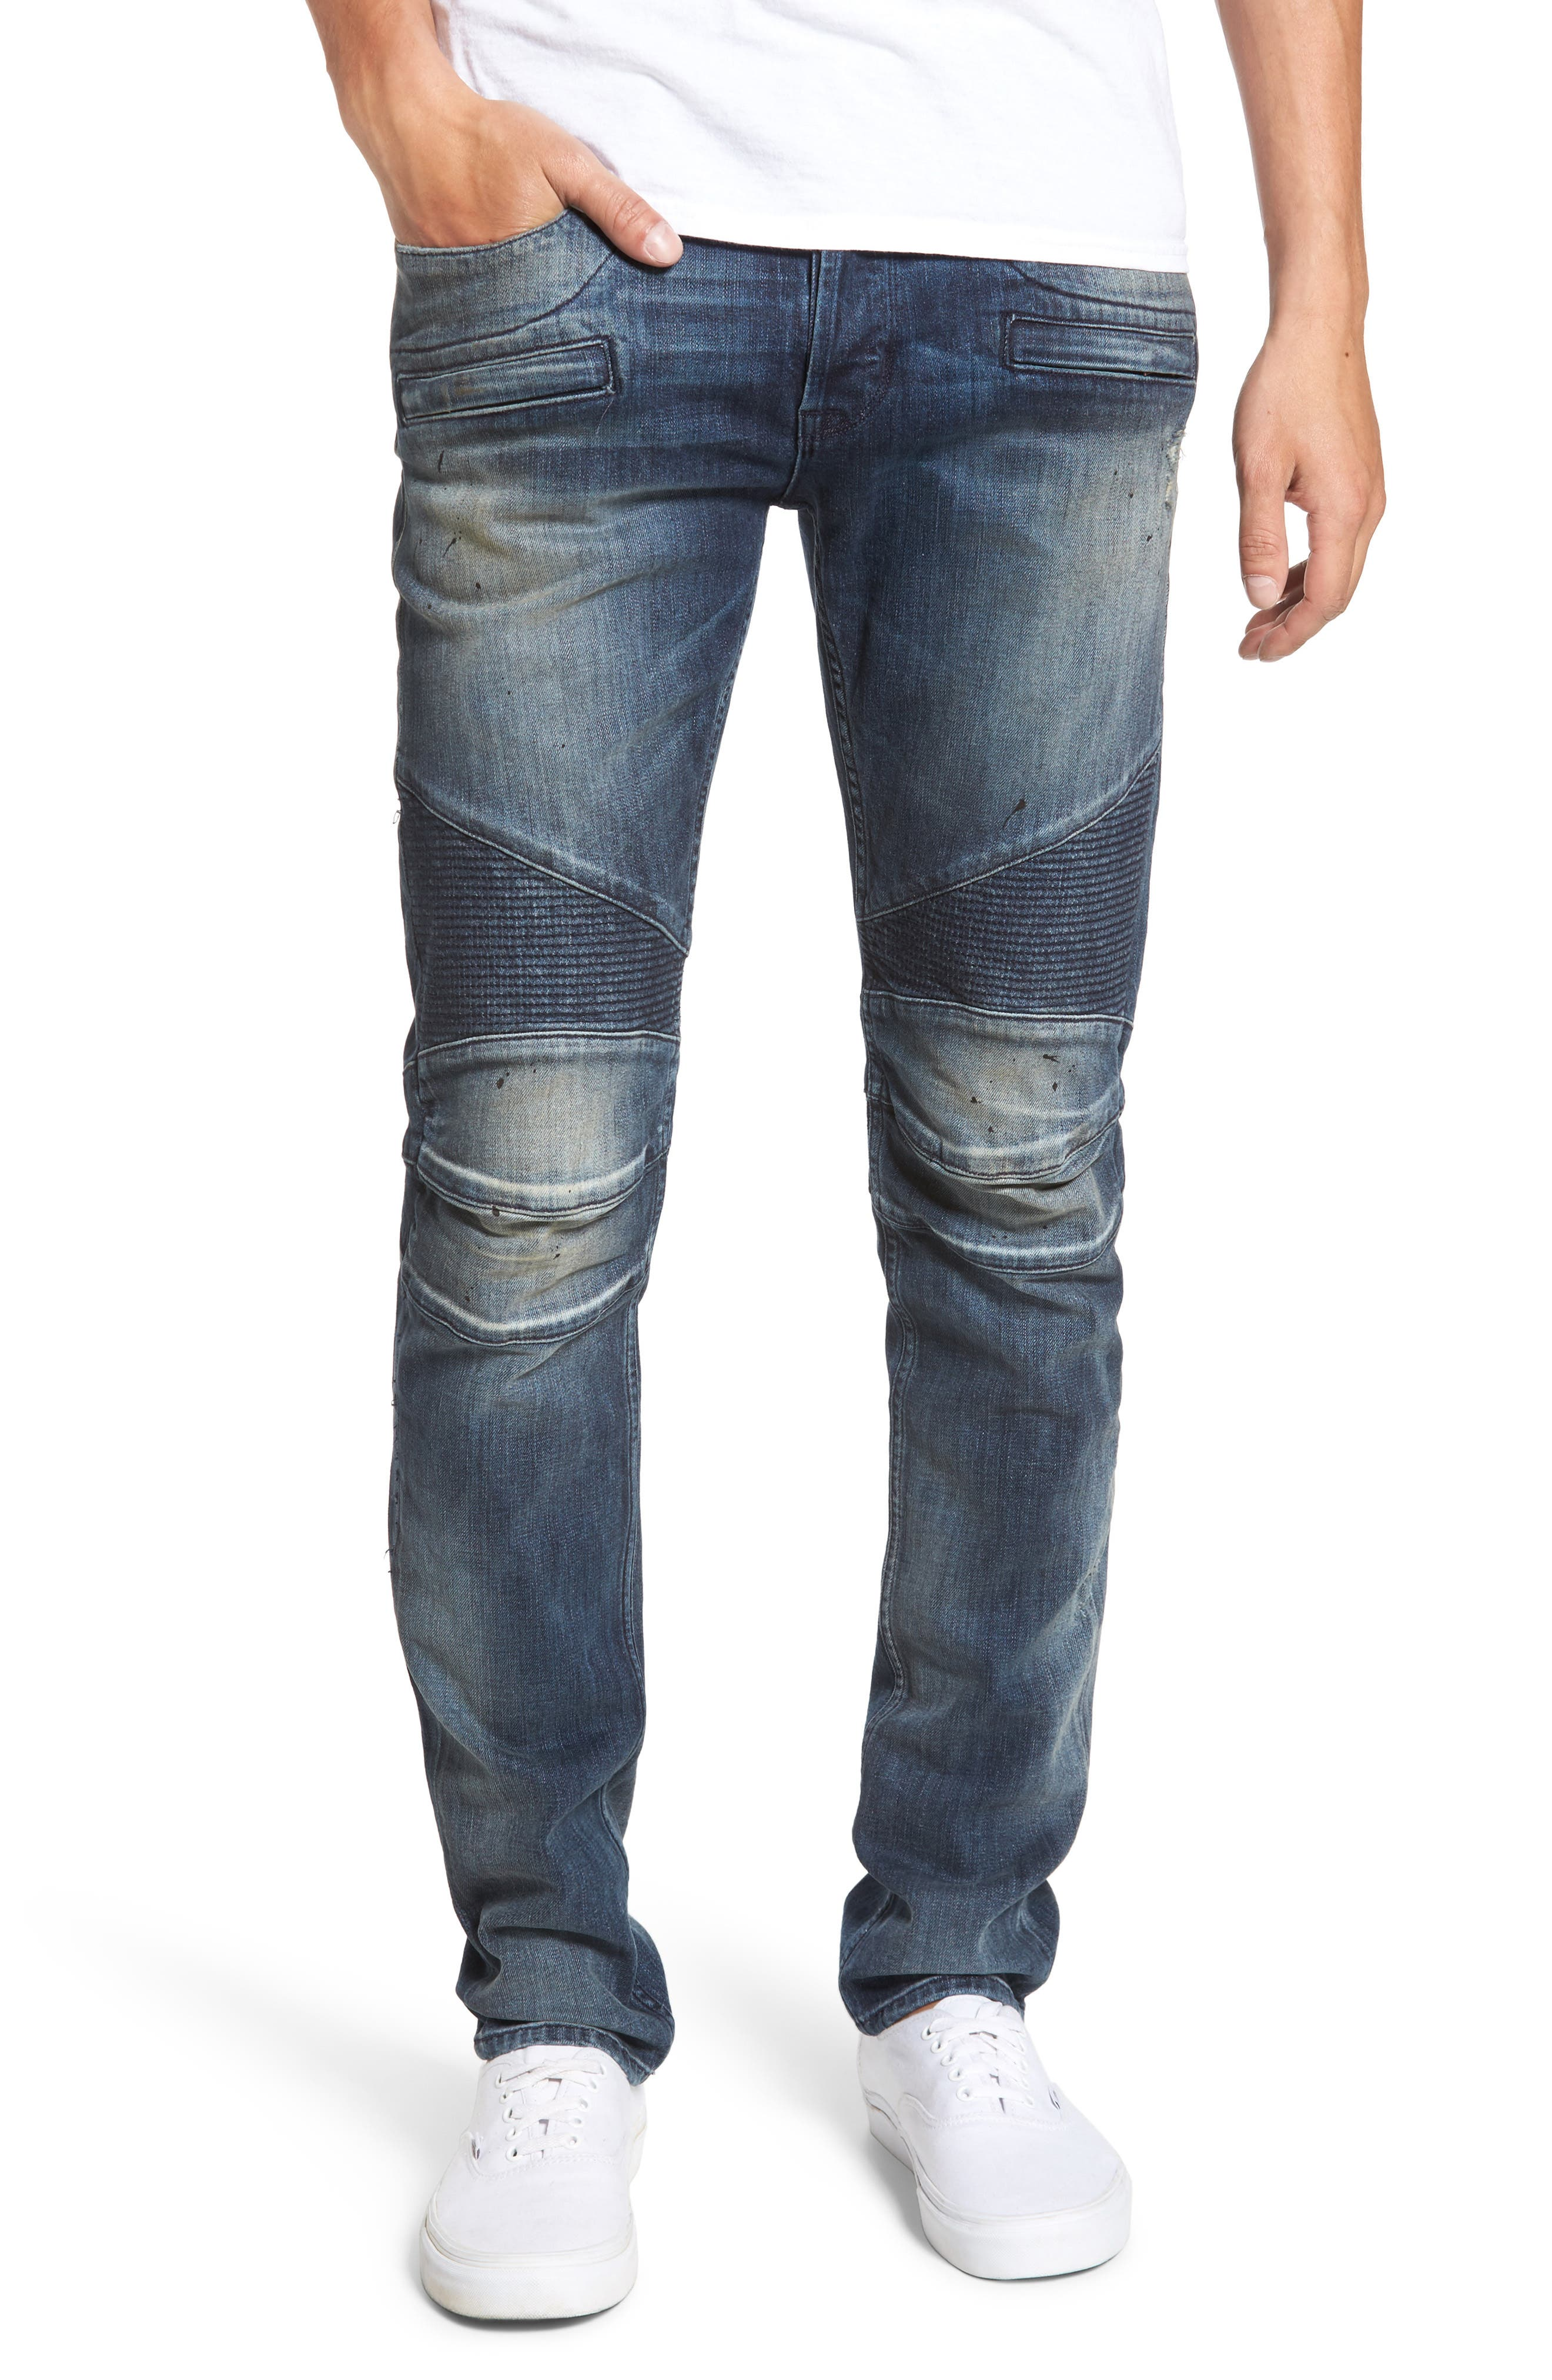 Hudson Jeans Blinder Biker Moto Skinny Fit Jeans (Babylon)